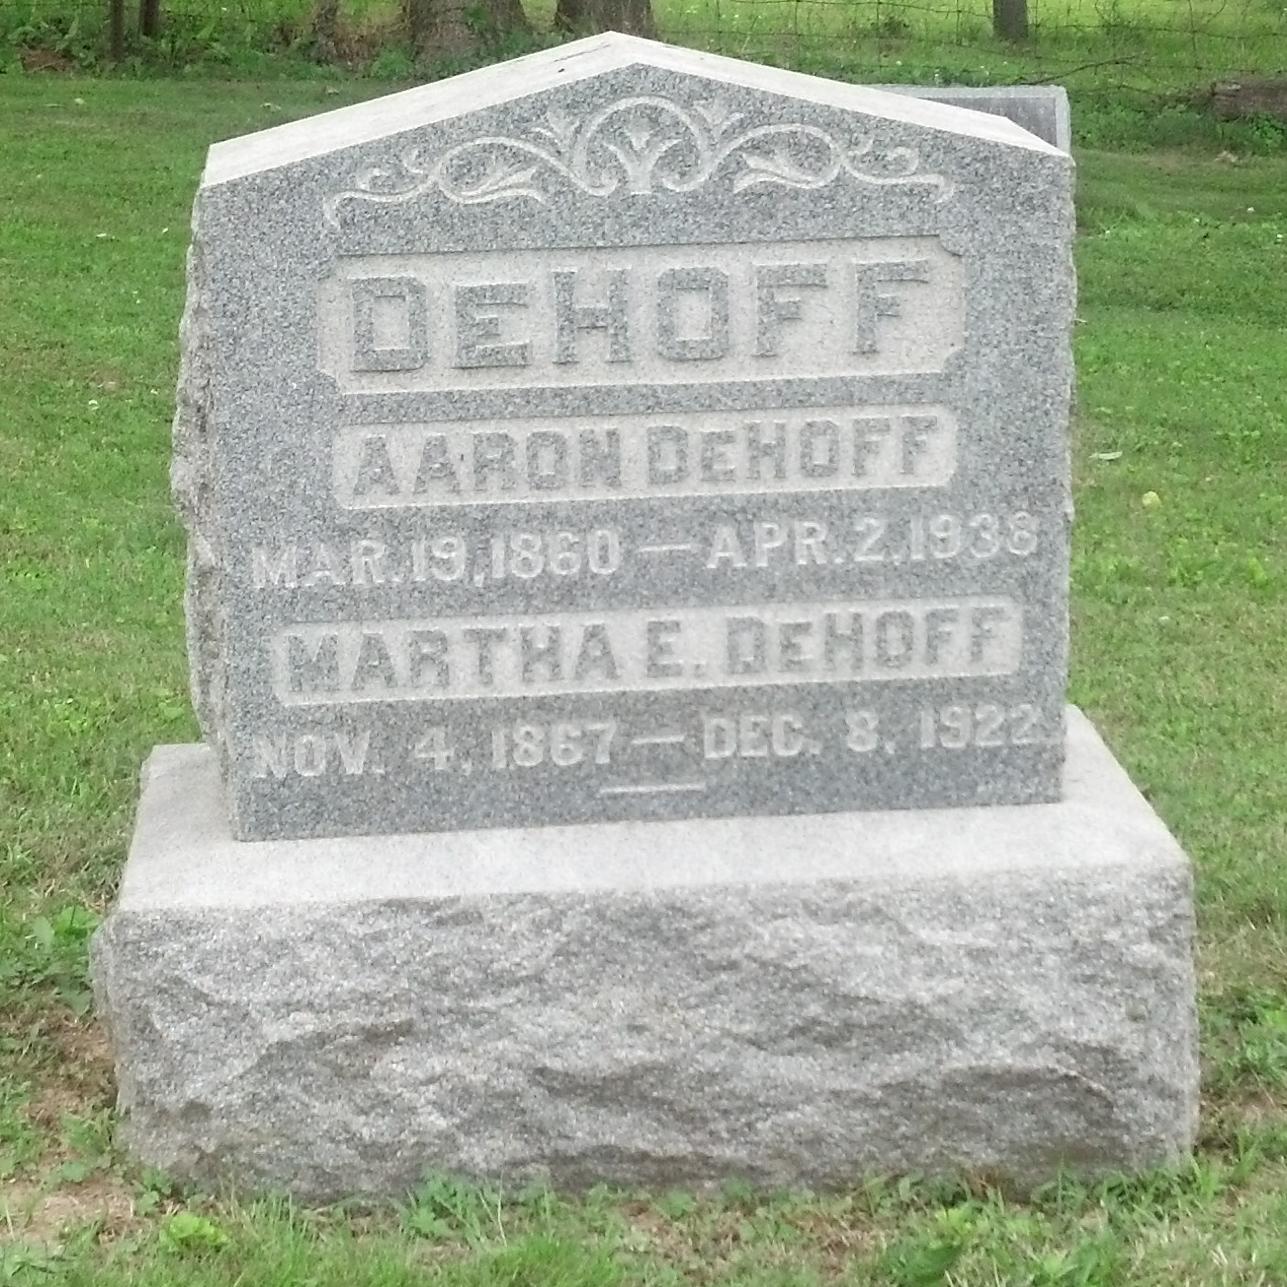 Aaron DeHoff